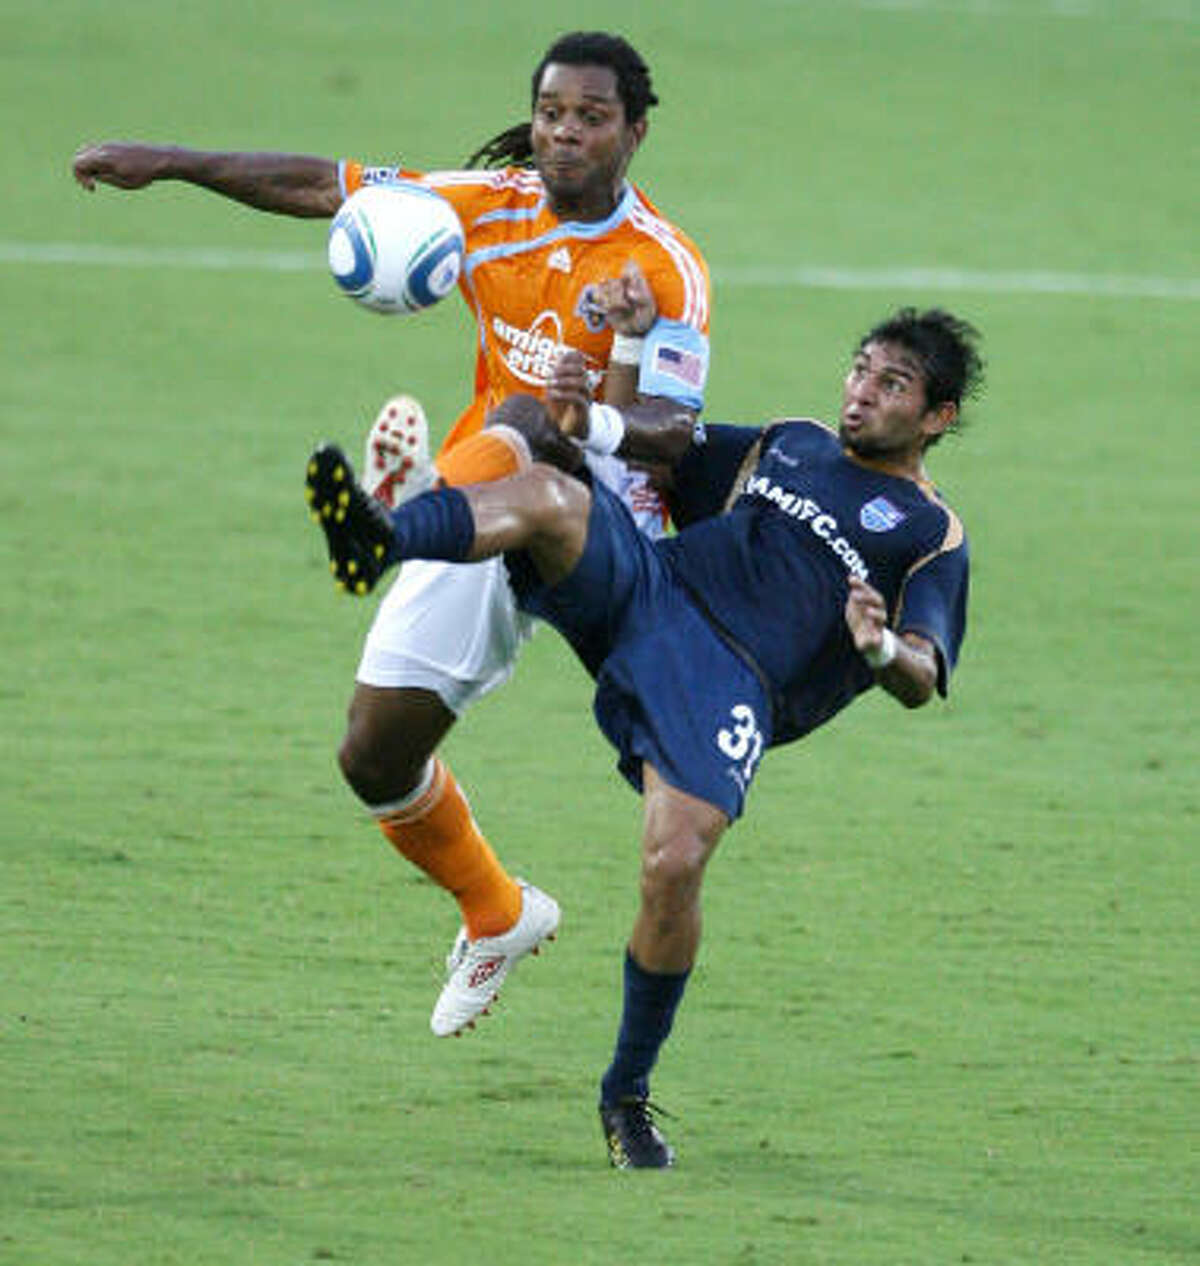 Adrian Serioux fights for the ball with Miami FC forward Paulo Araujo Junior in a 1-0 win for the Dynamo.